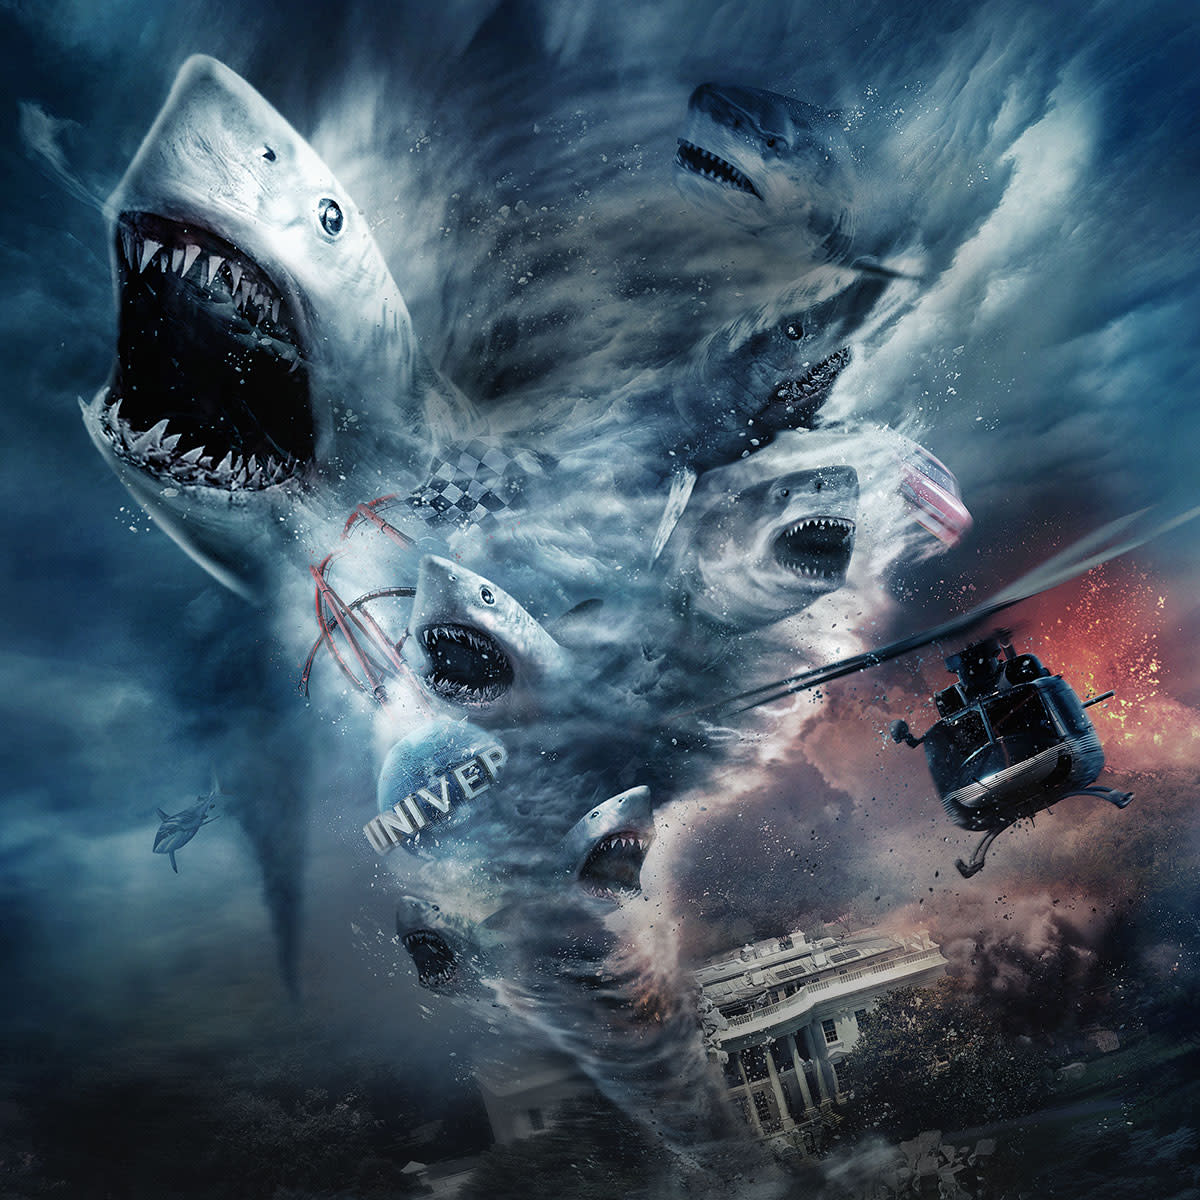 Top 6 Insane Shark Horror Movies